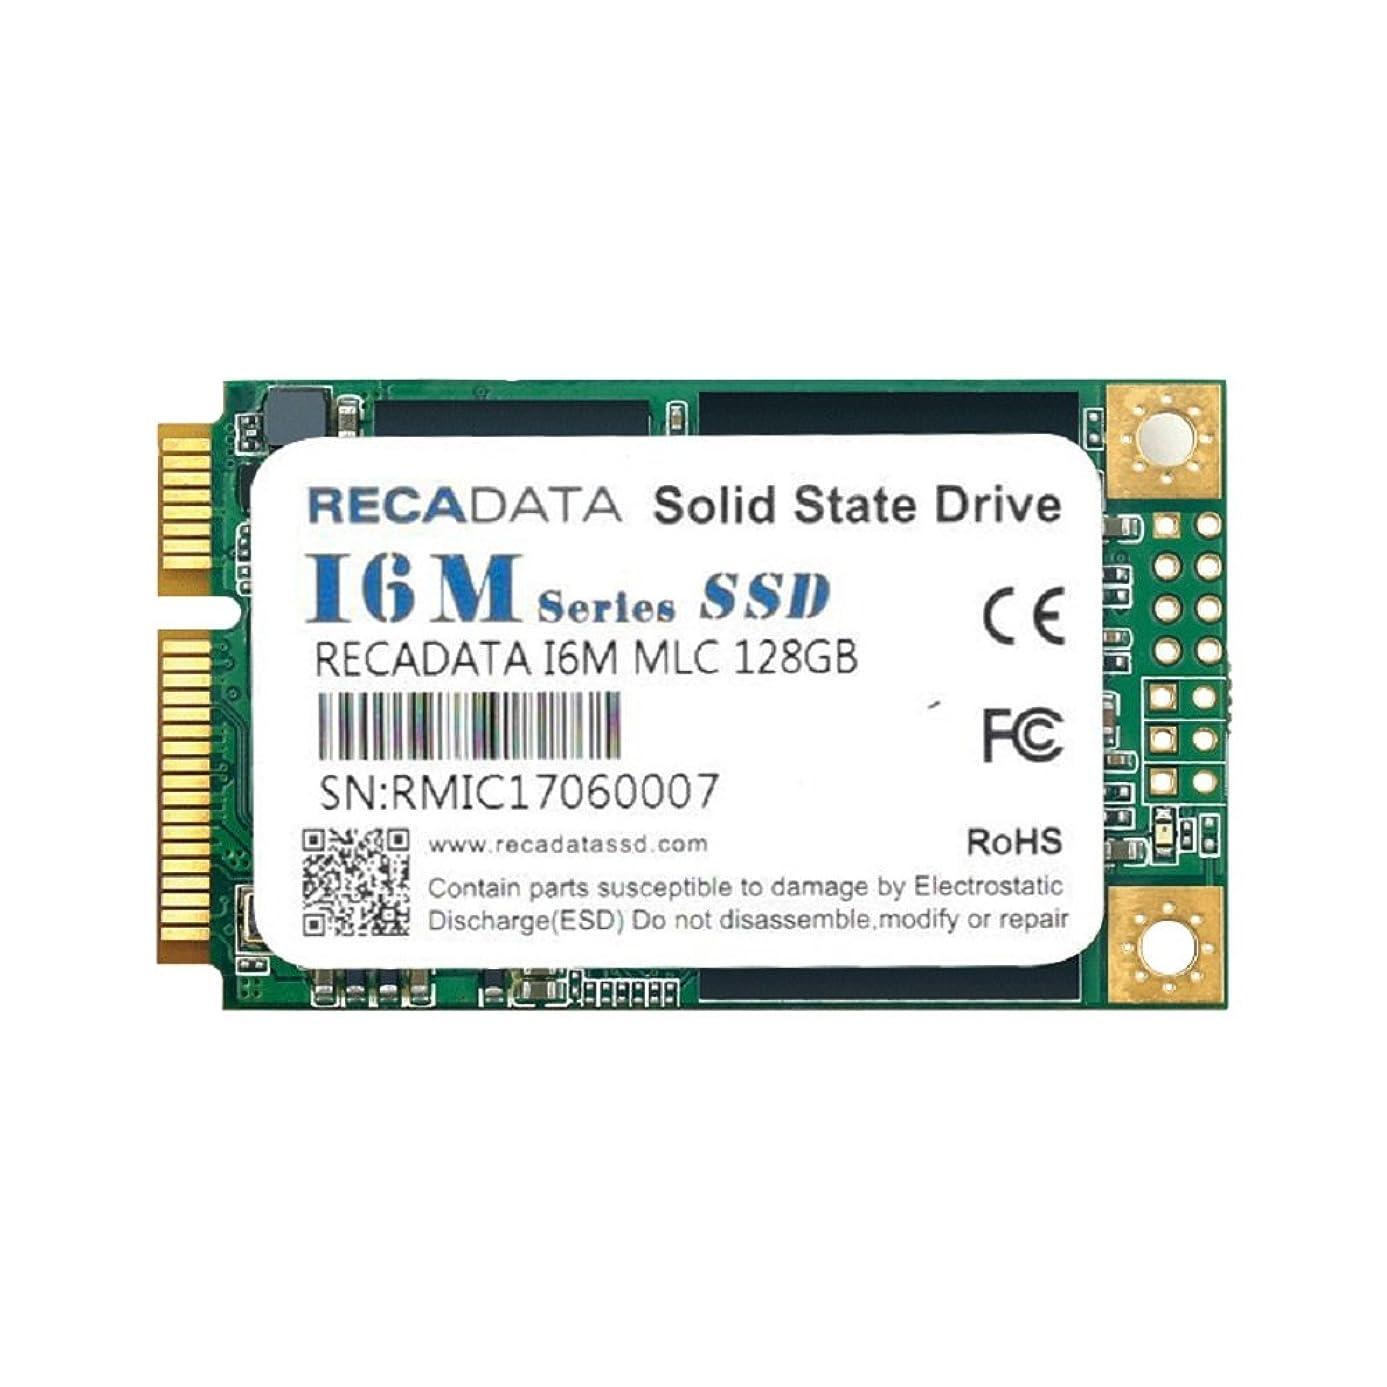 RECADATA mSATA III MLC High Level Enterprise Class Solid State Drive SSD (256GB)